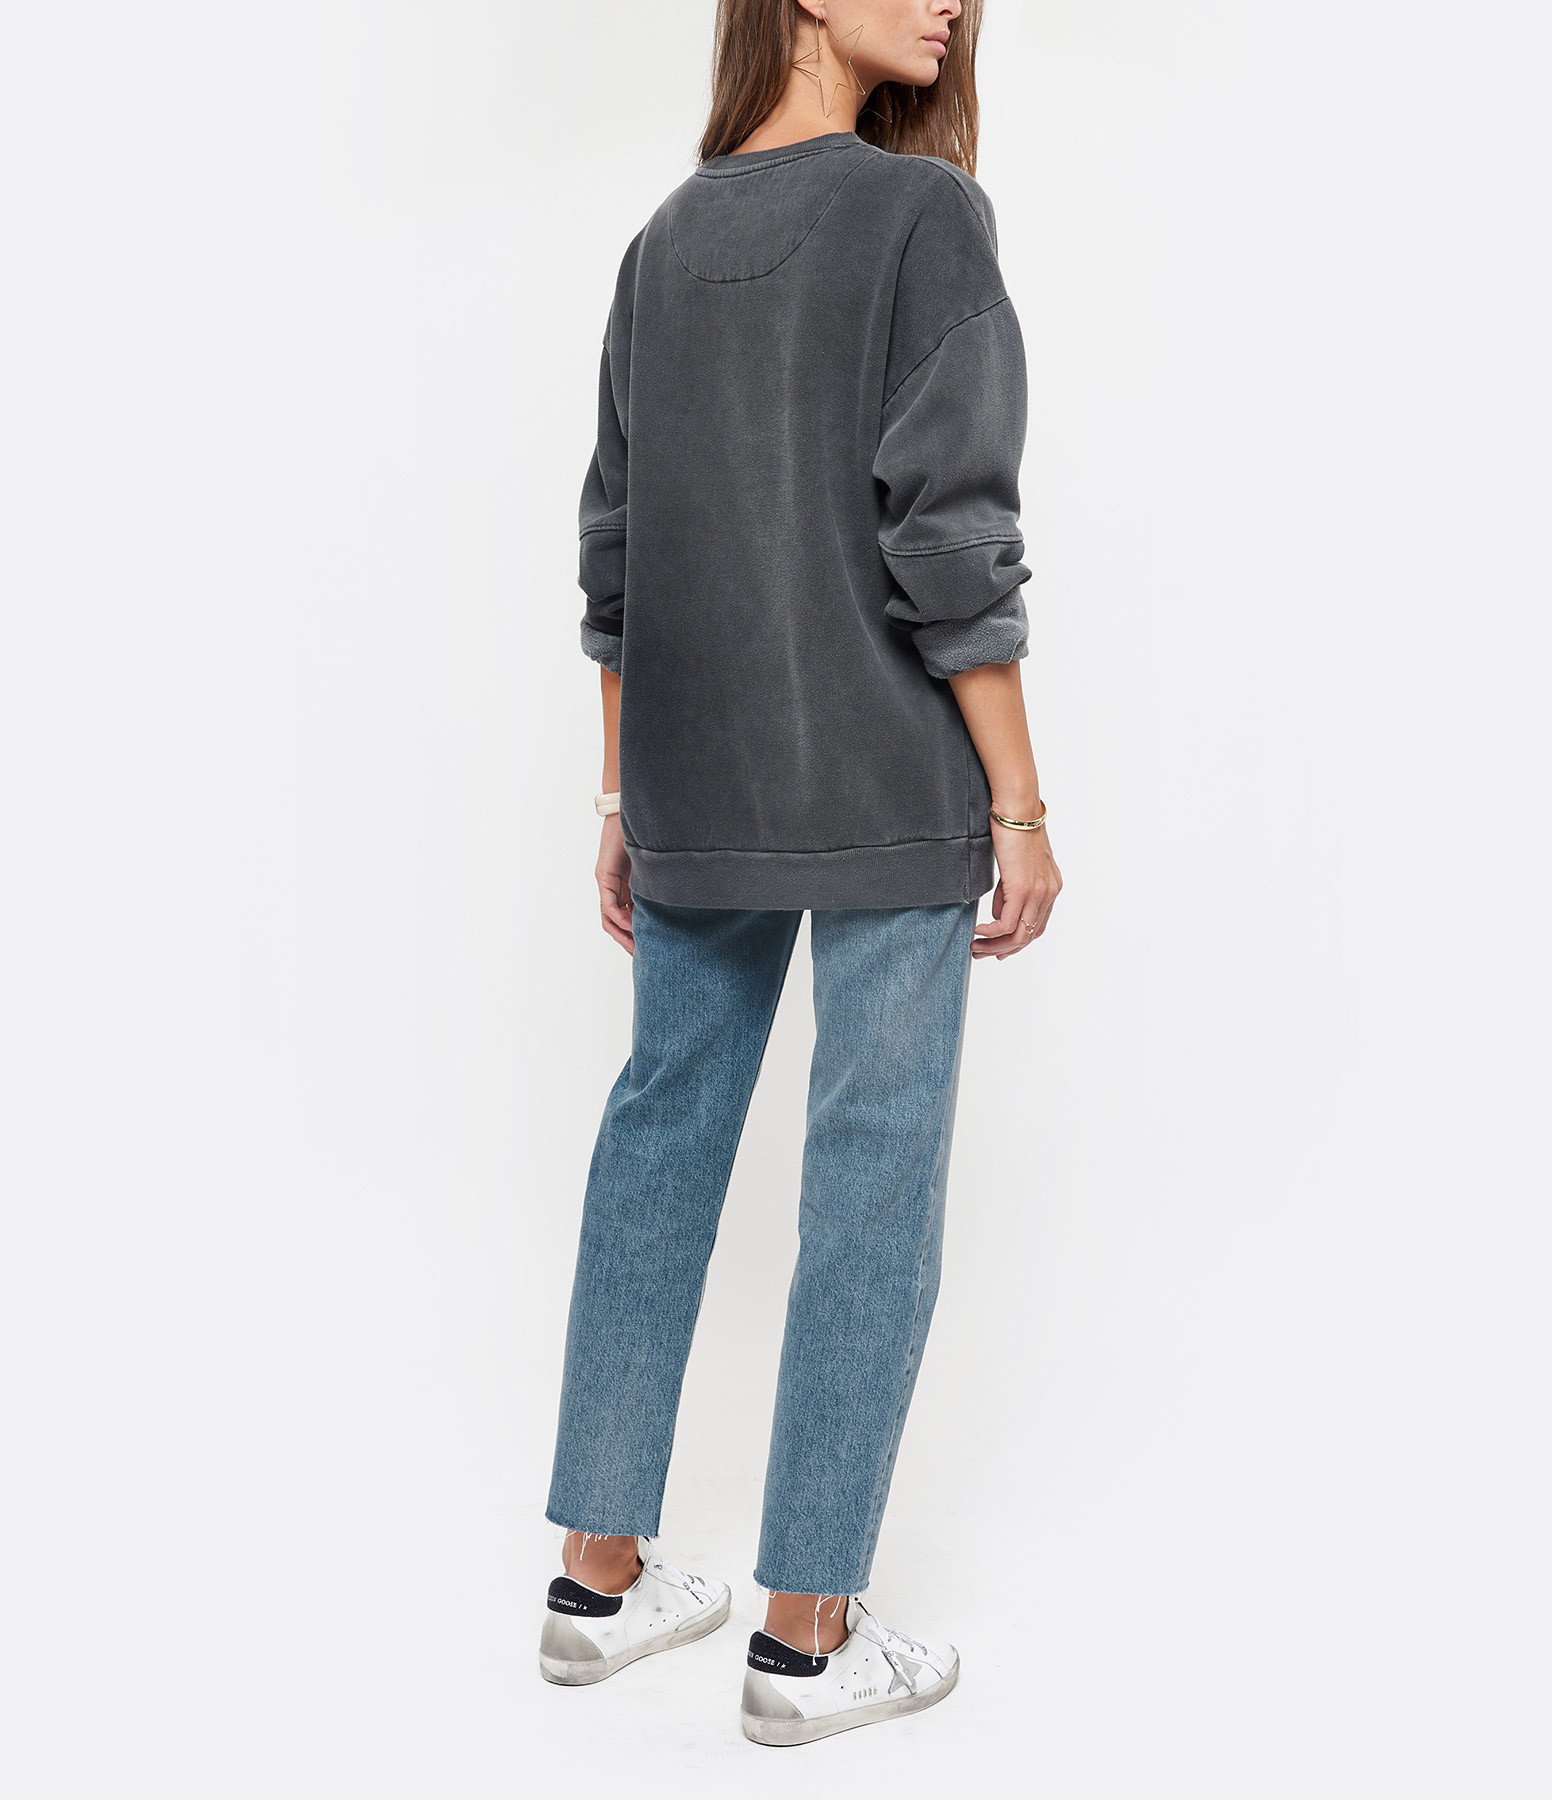 NEWTONE - Sweatshirt Roller Rockin Coton Pepper